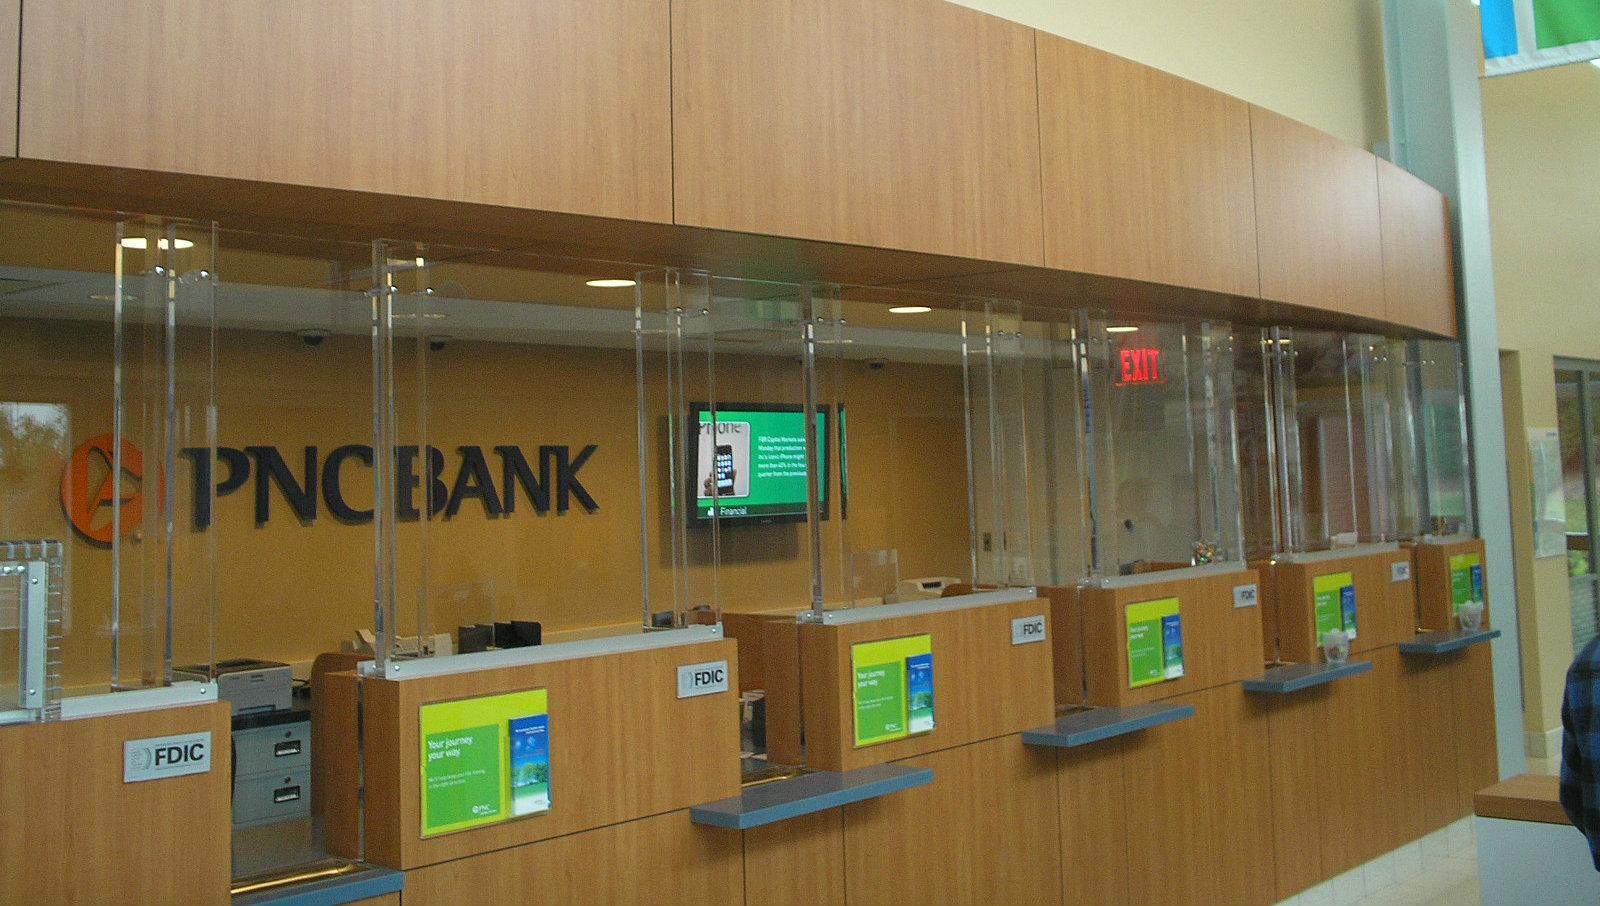 Renovated PNC Bank front desk